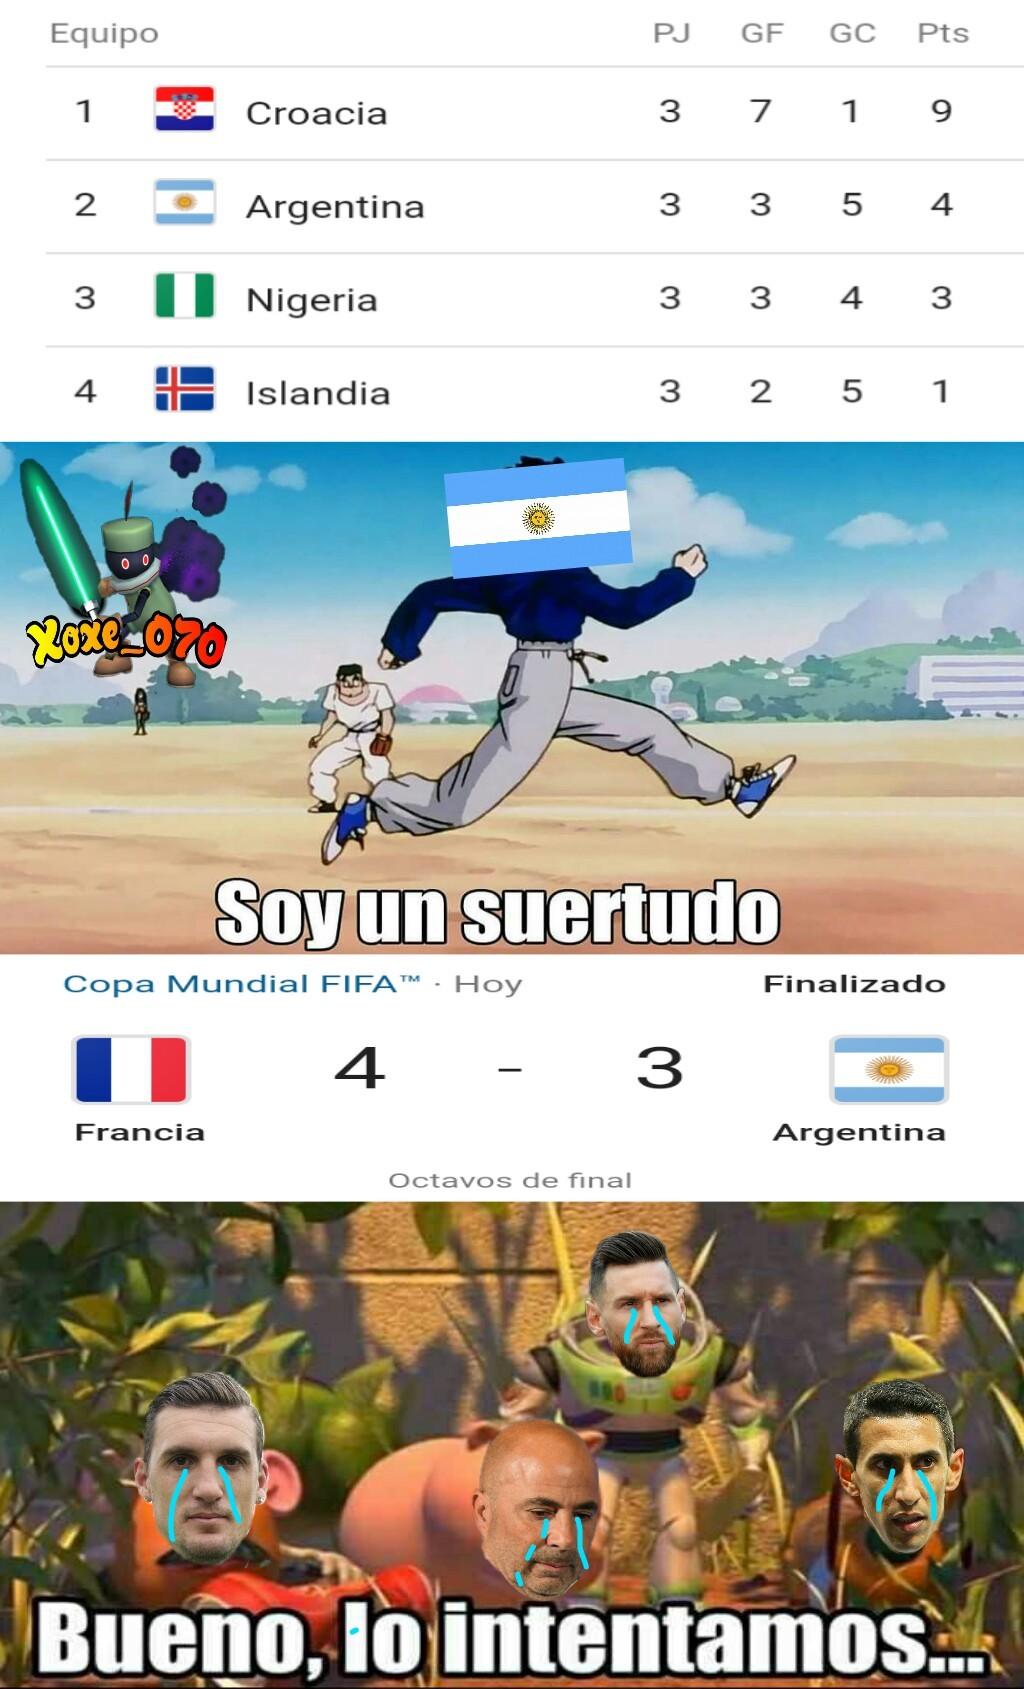 Jasjas sampaoli es el chancho jasjas, cago argentina XD - meme